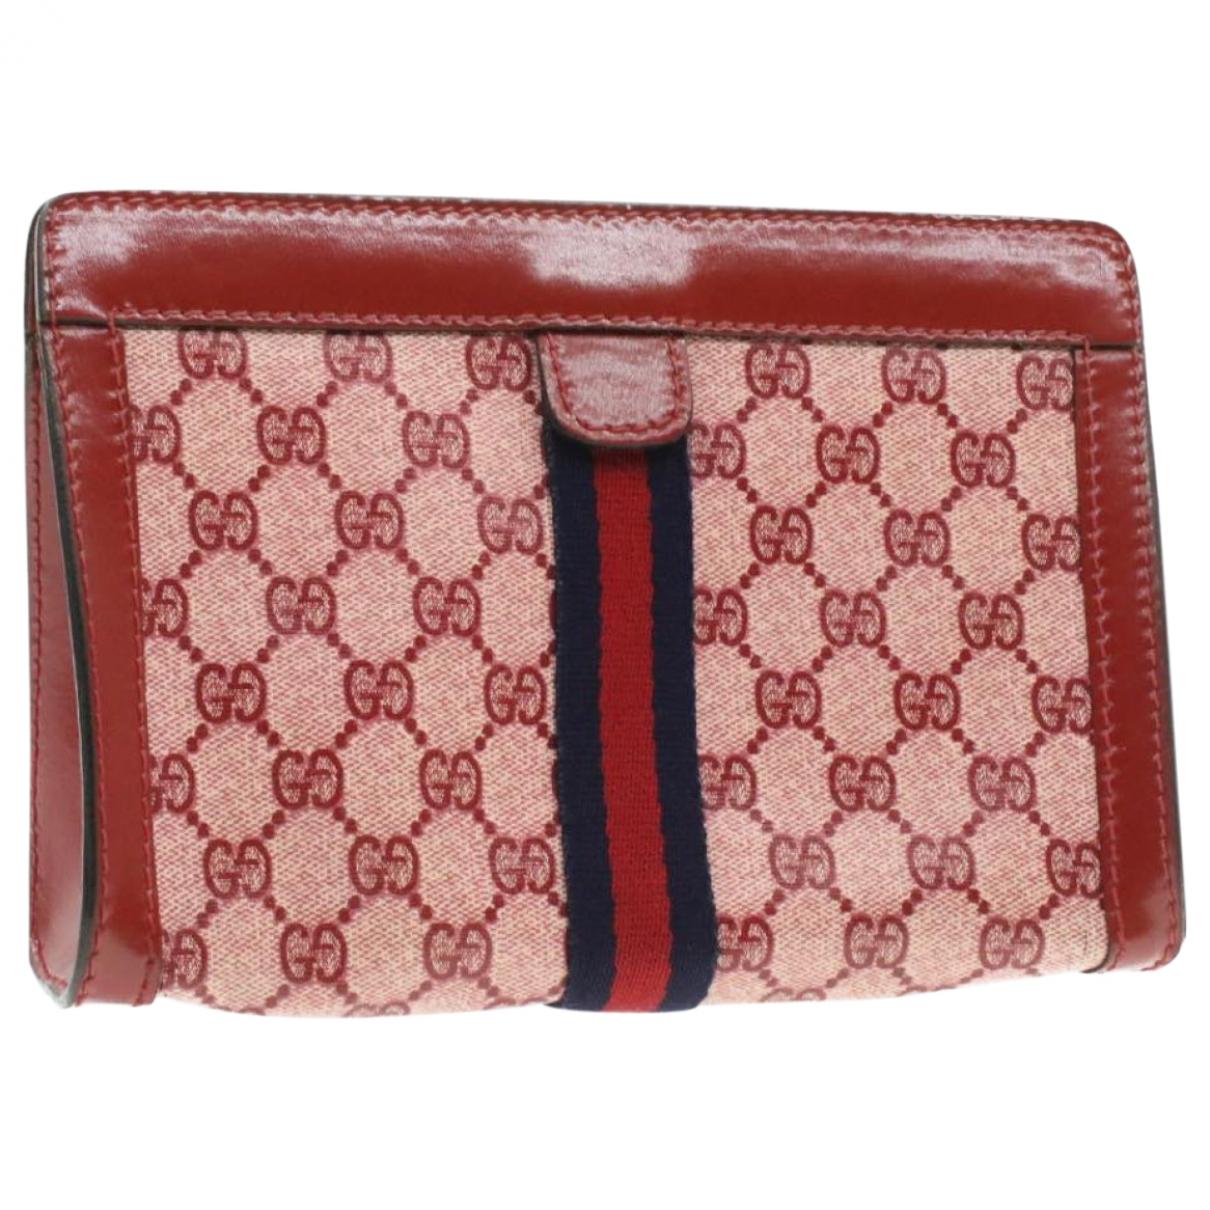 Gucci N Red Cloth Clutch bag for Women N